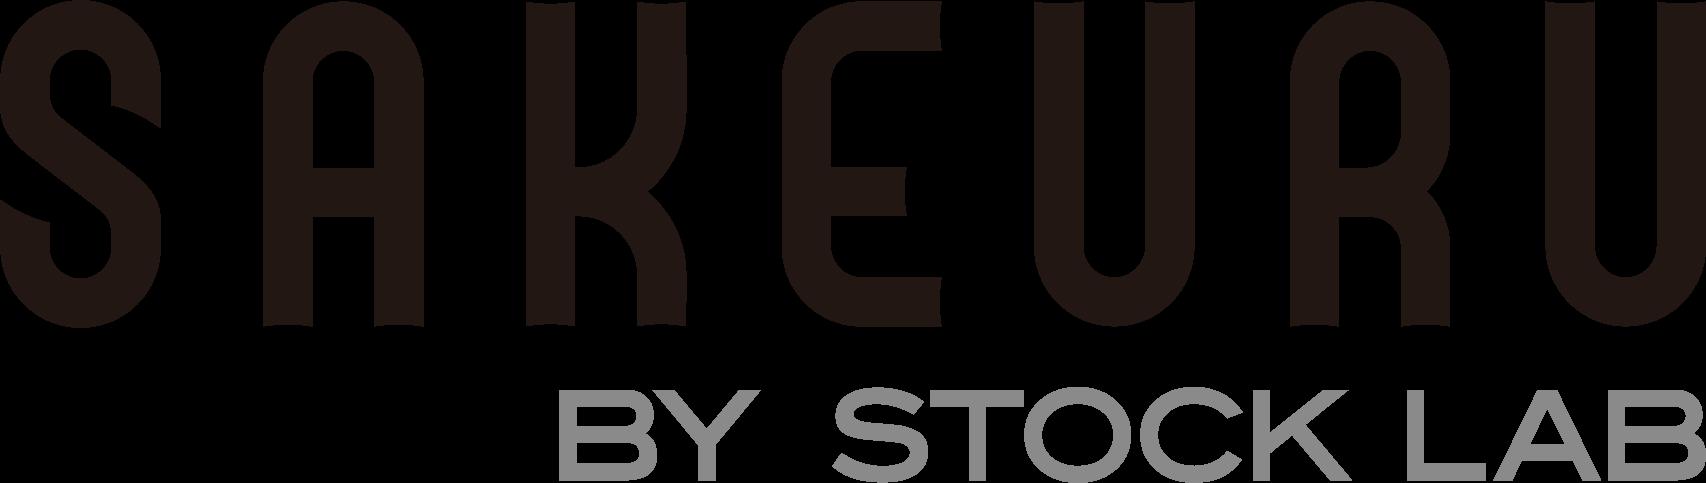 SAKEURU BY STOCK LAB